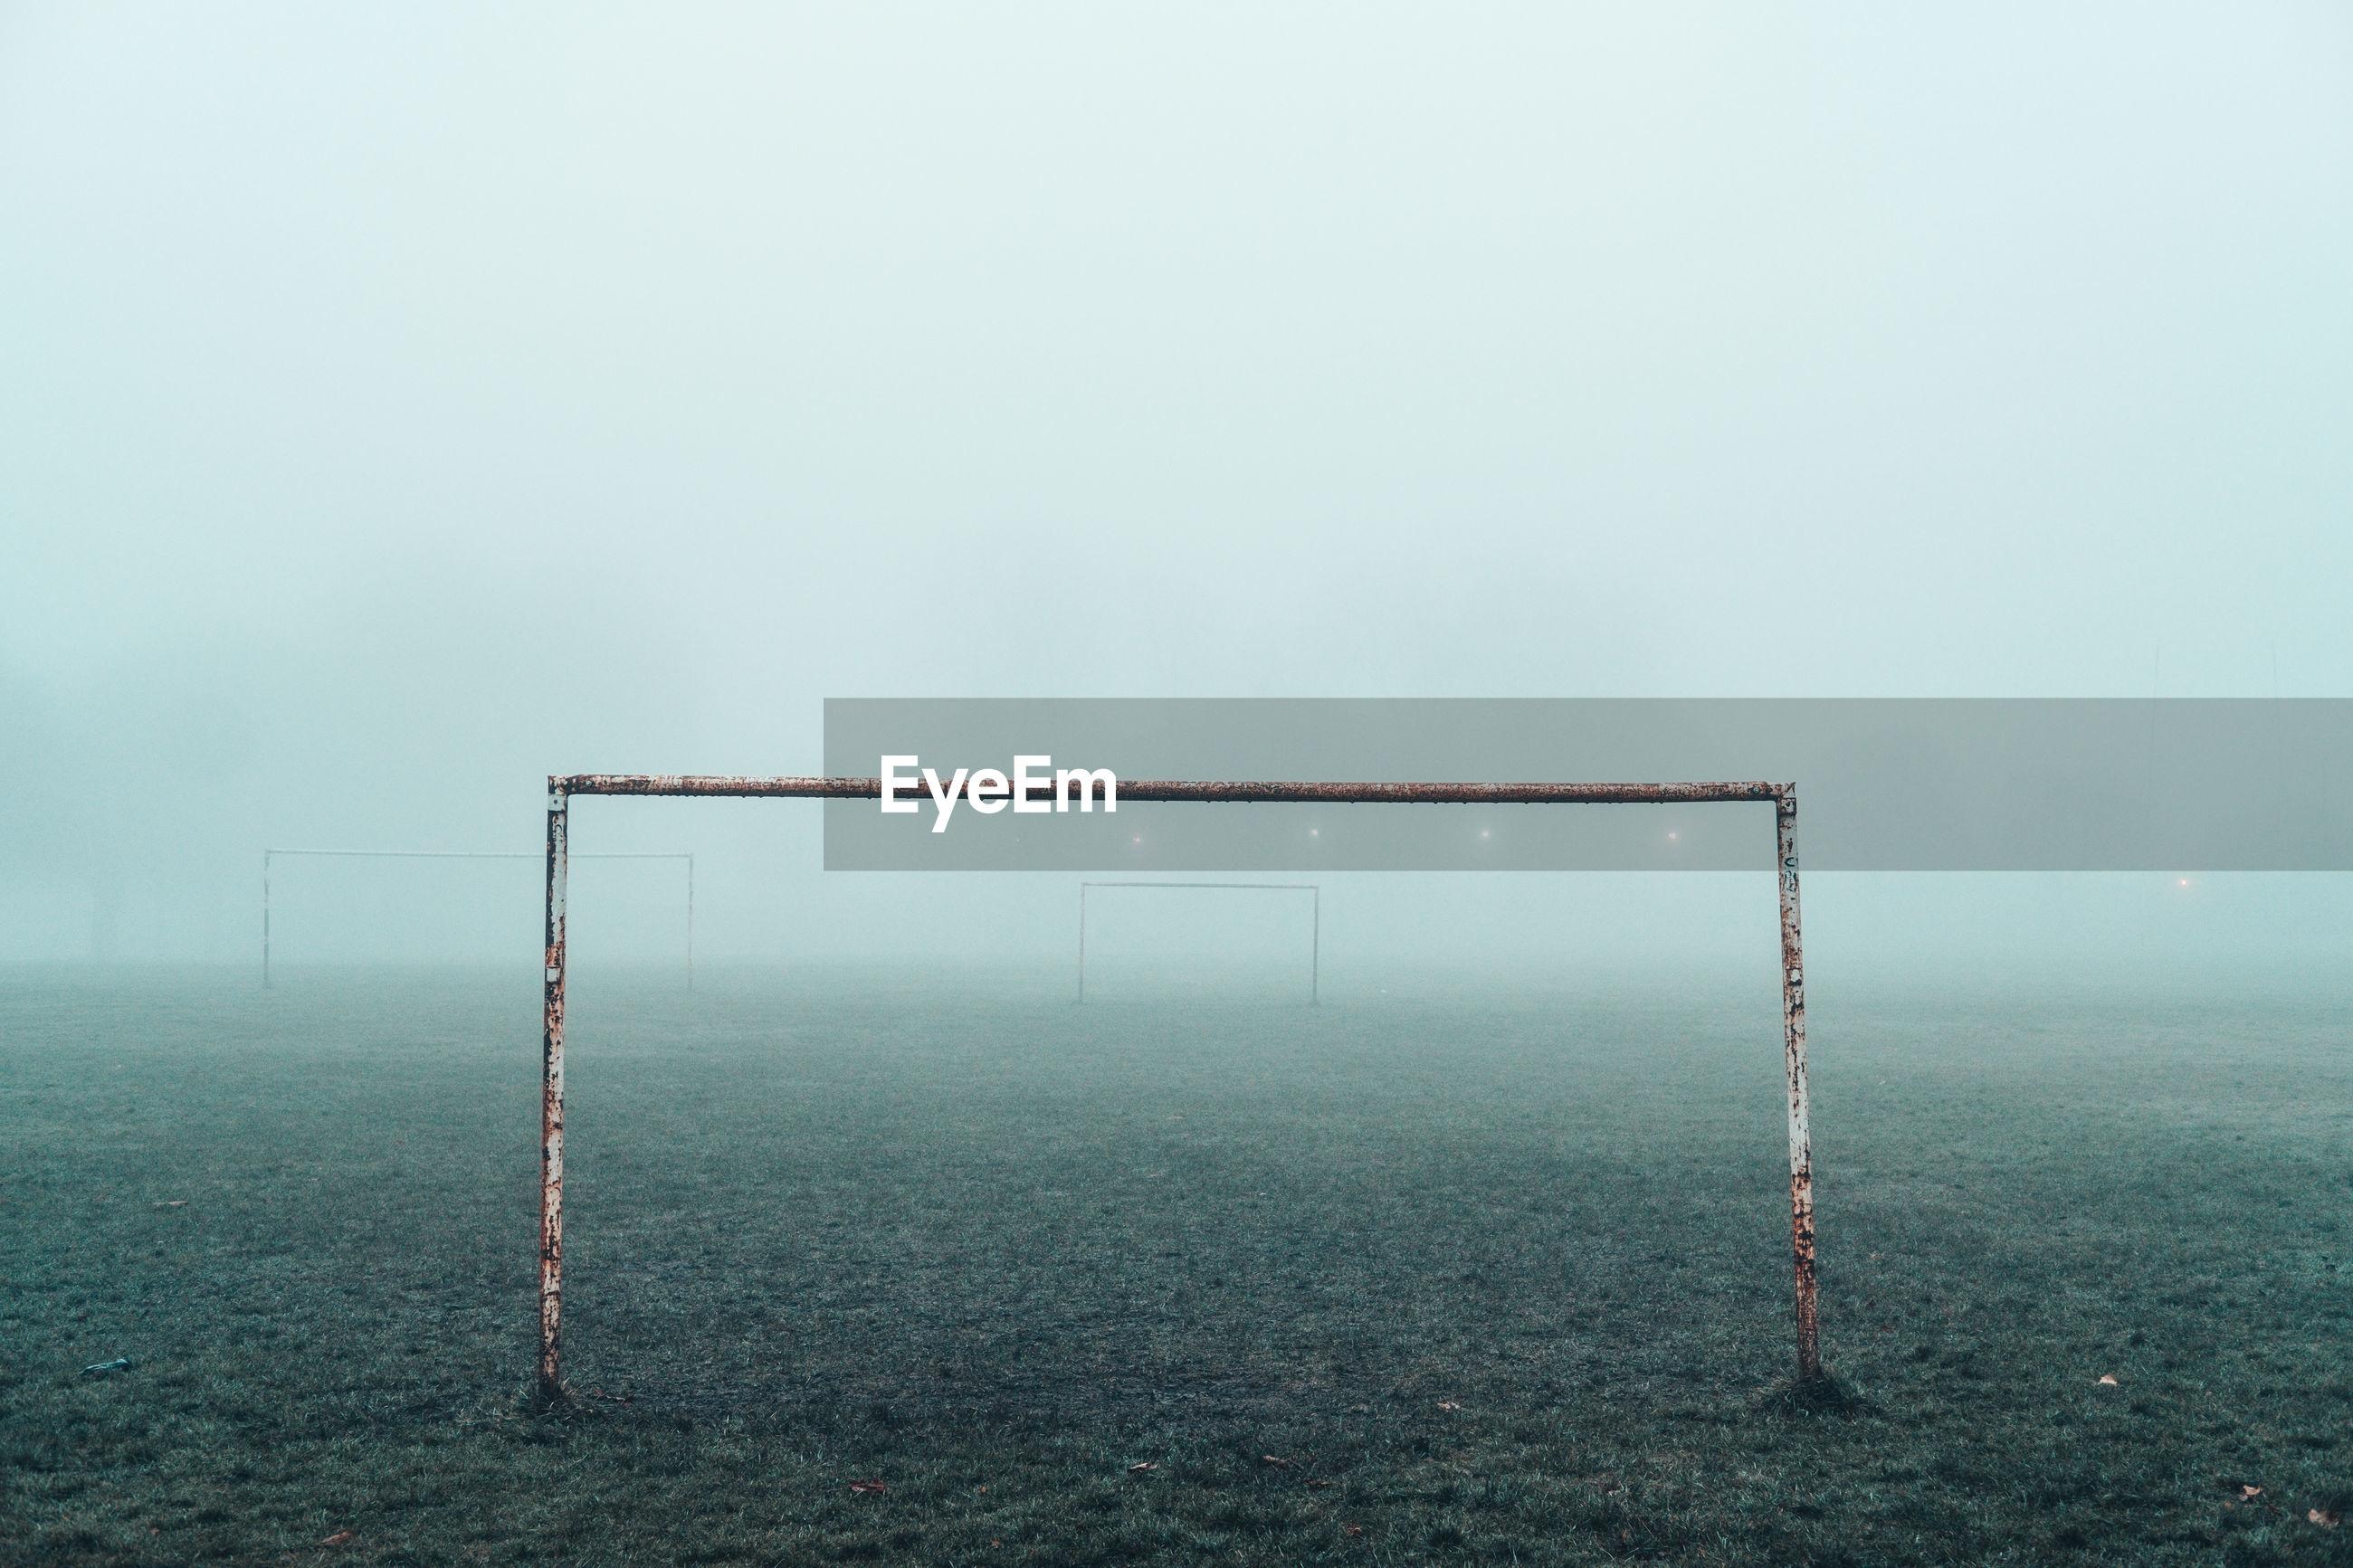 VIEW OF SOCCER BALL IN FOG